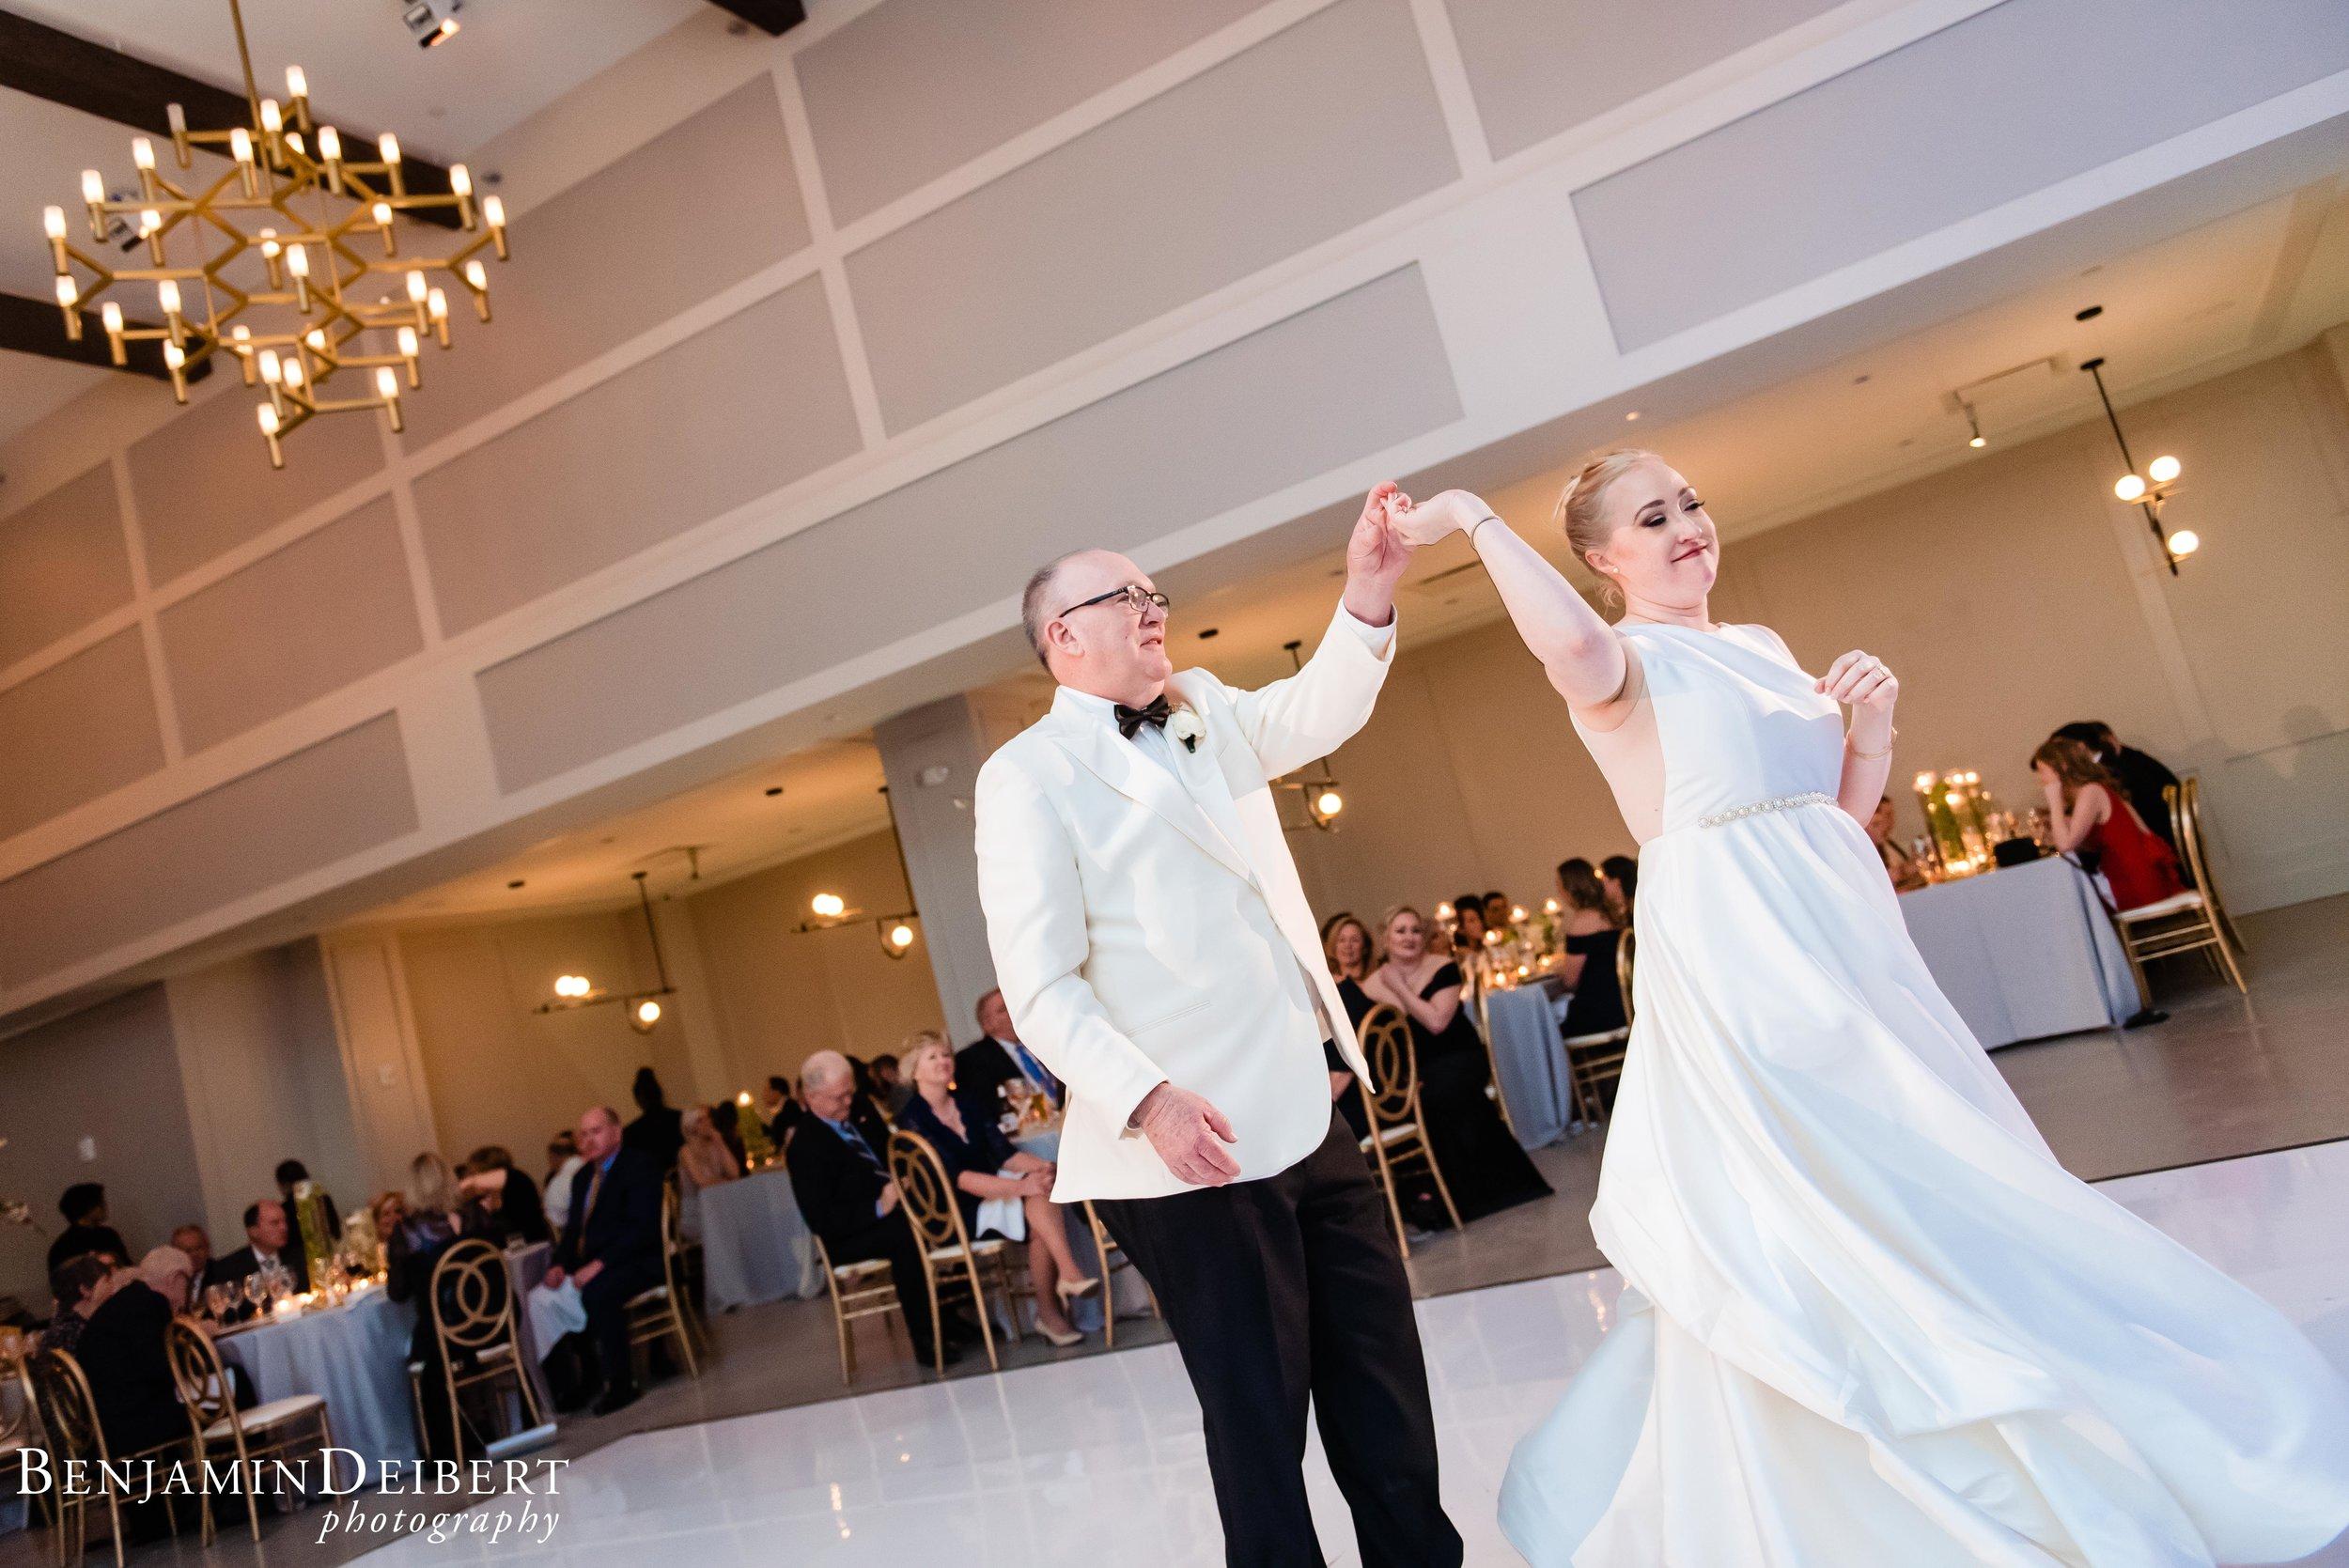 PatriceandAdam_TheLucy__Cescaphe_Wedding-71.jpg